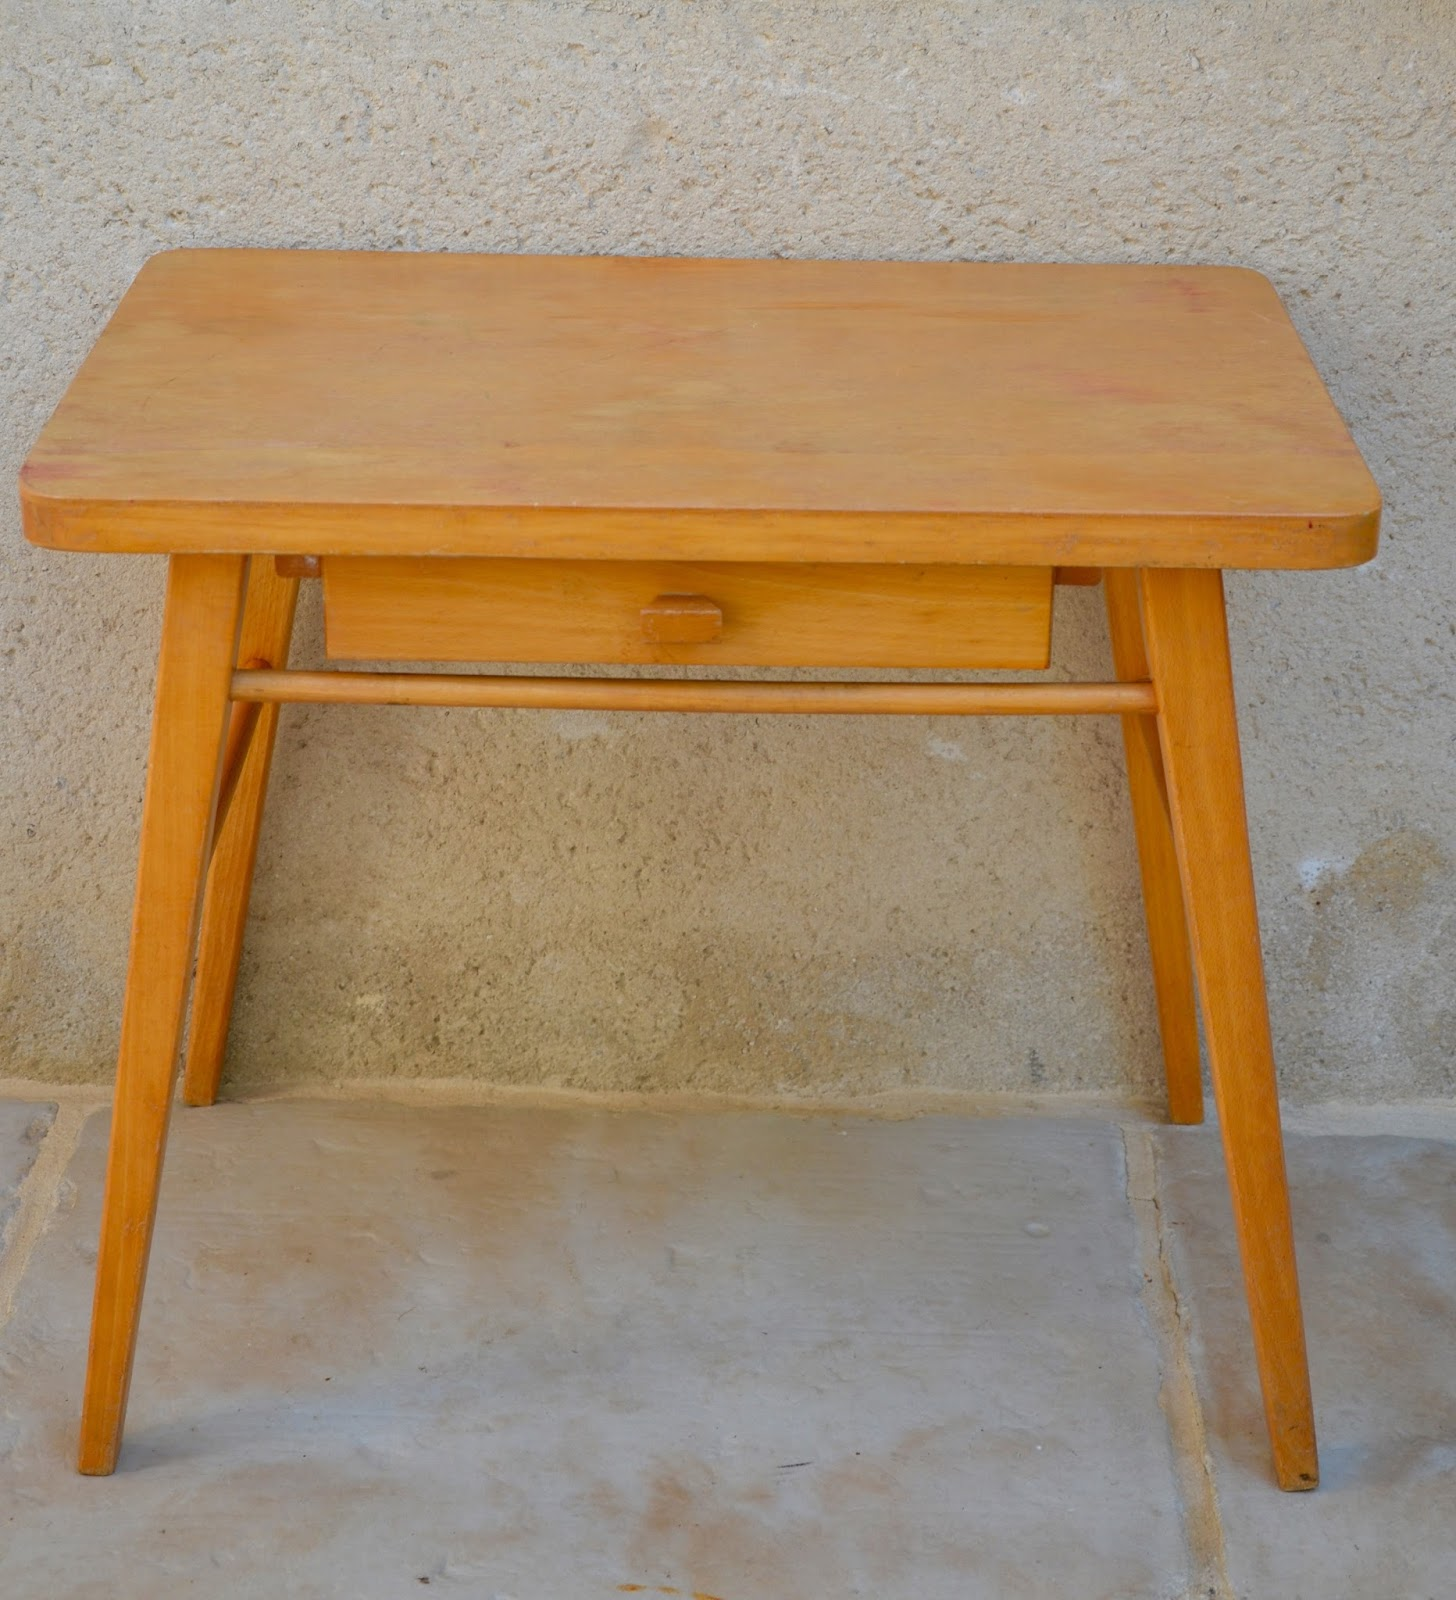 tuto chaise trendy recouvrir une chaise en paille tuto chaises ou ment retapisser une chaise en. Black Bedroom Furniture Sets. Home Design Ideas